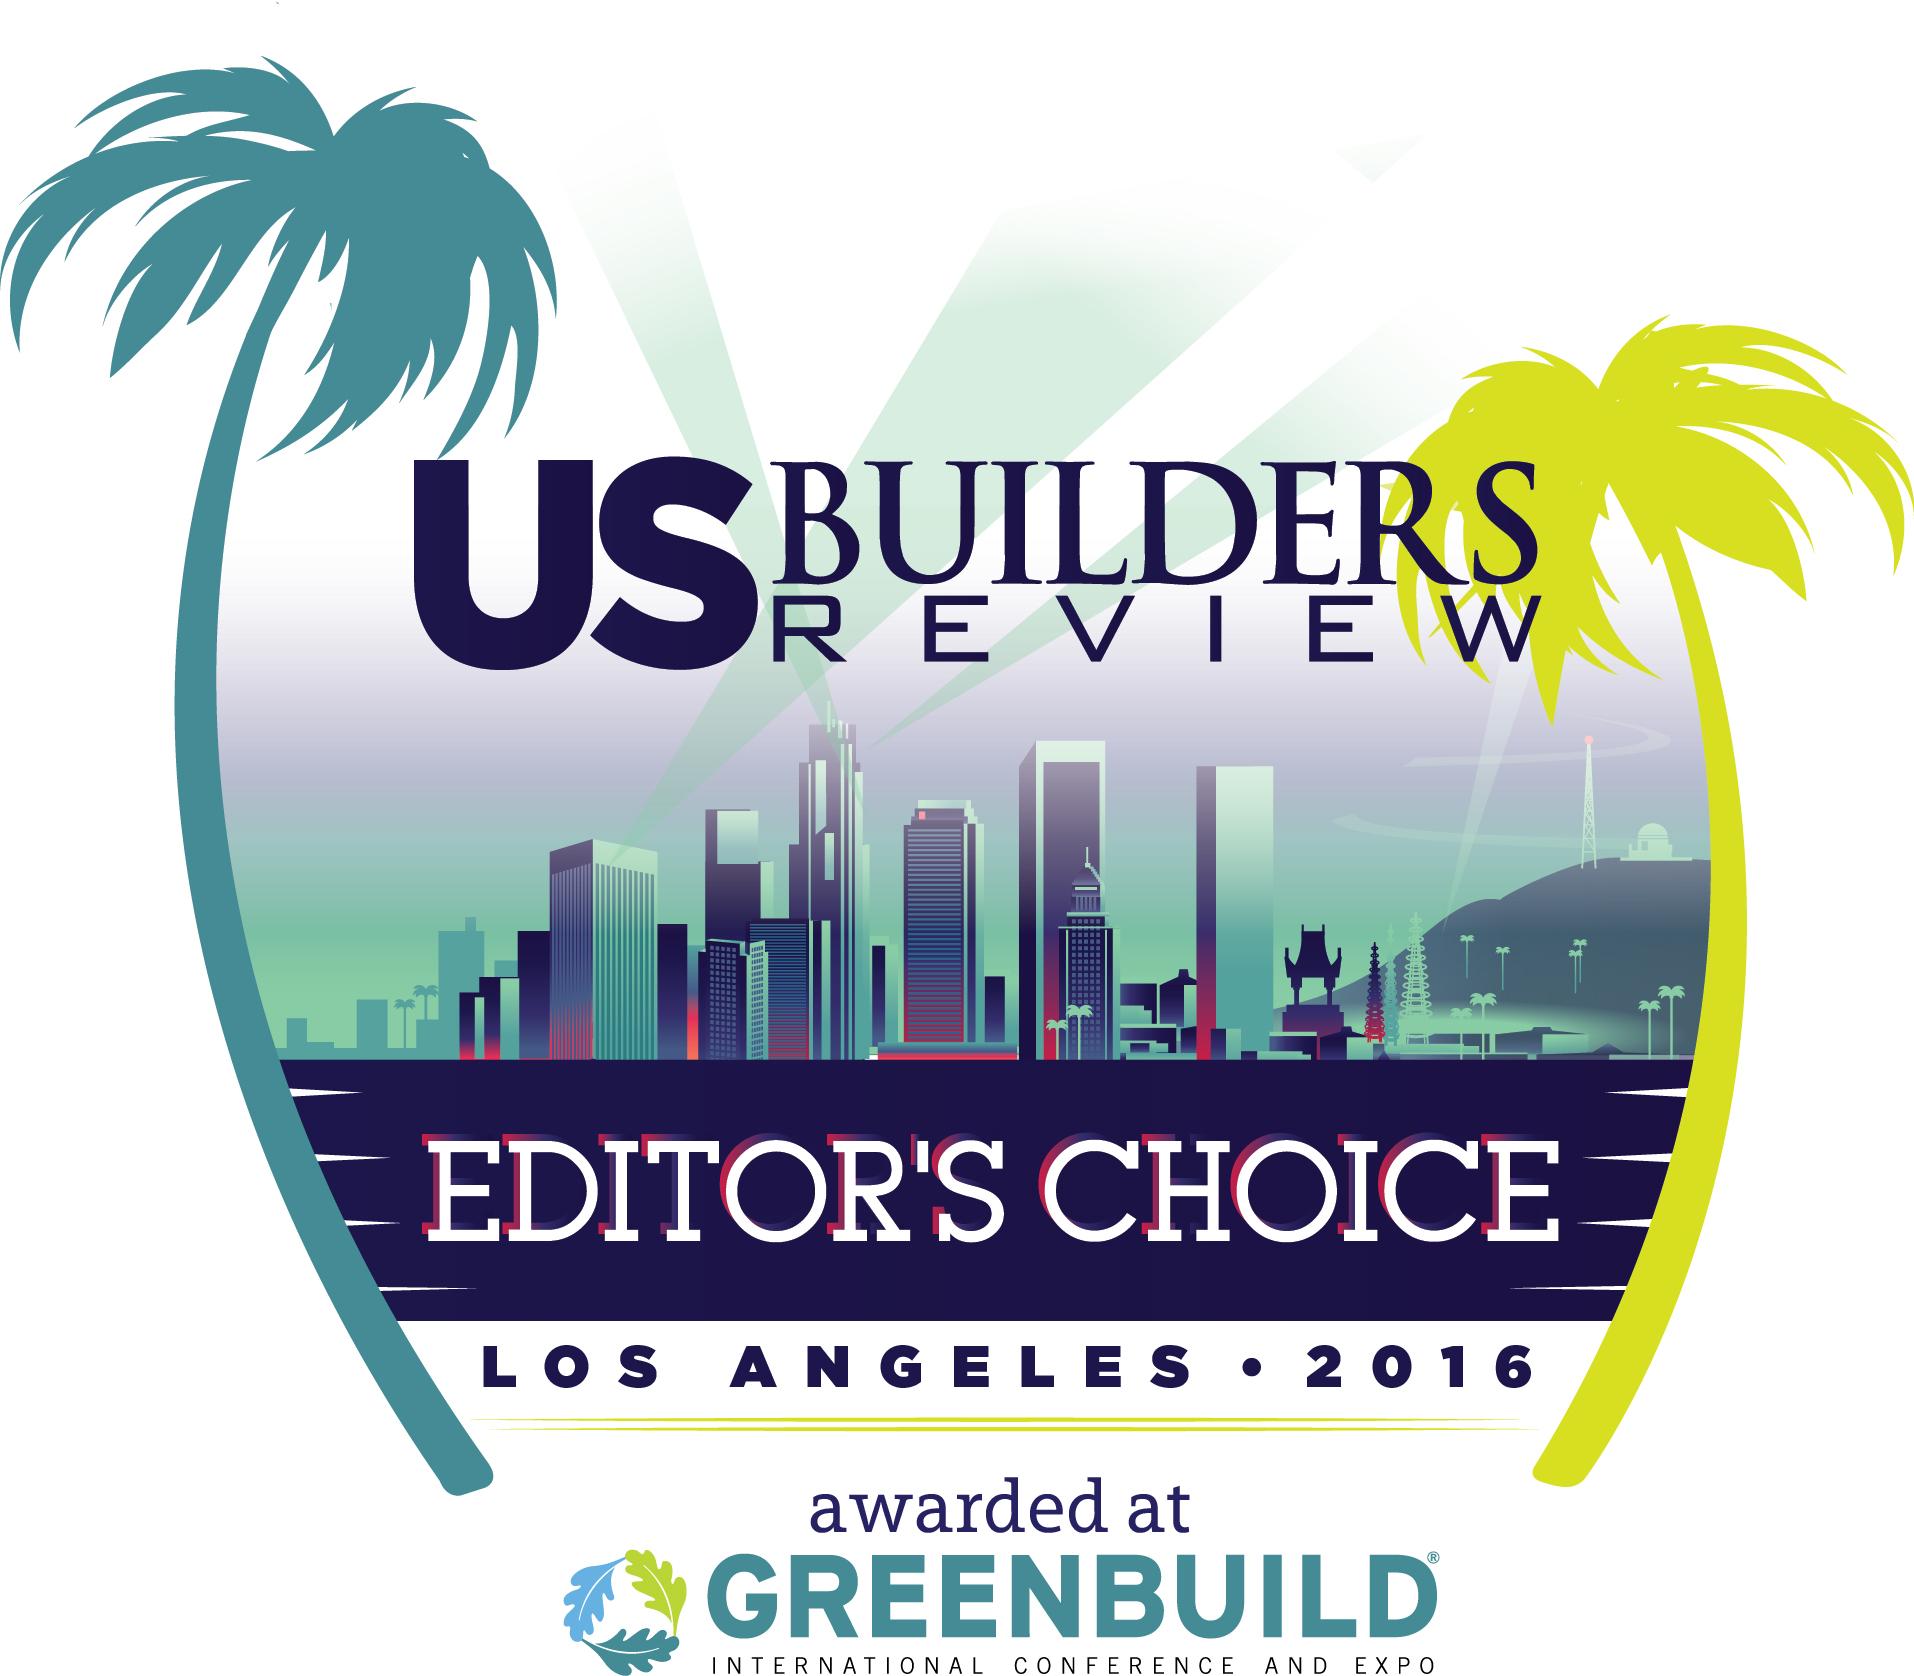 Greenbuild Editor's Choice 2016